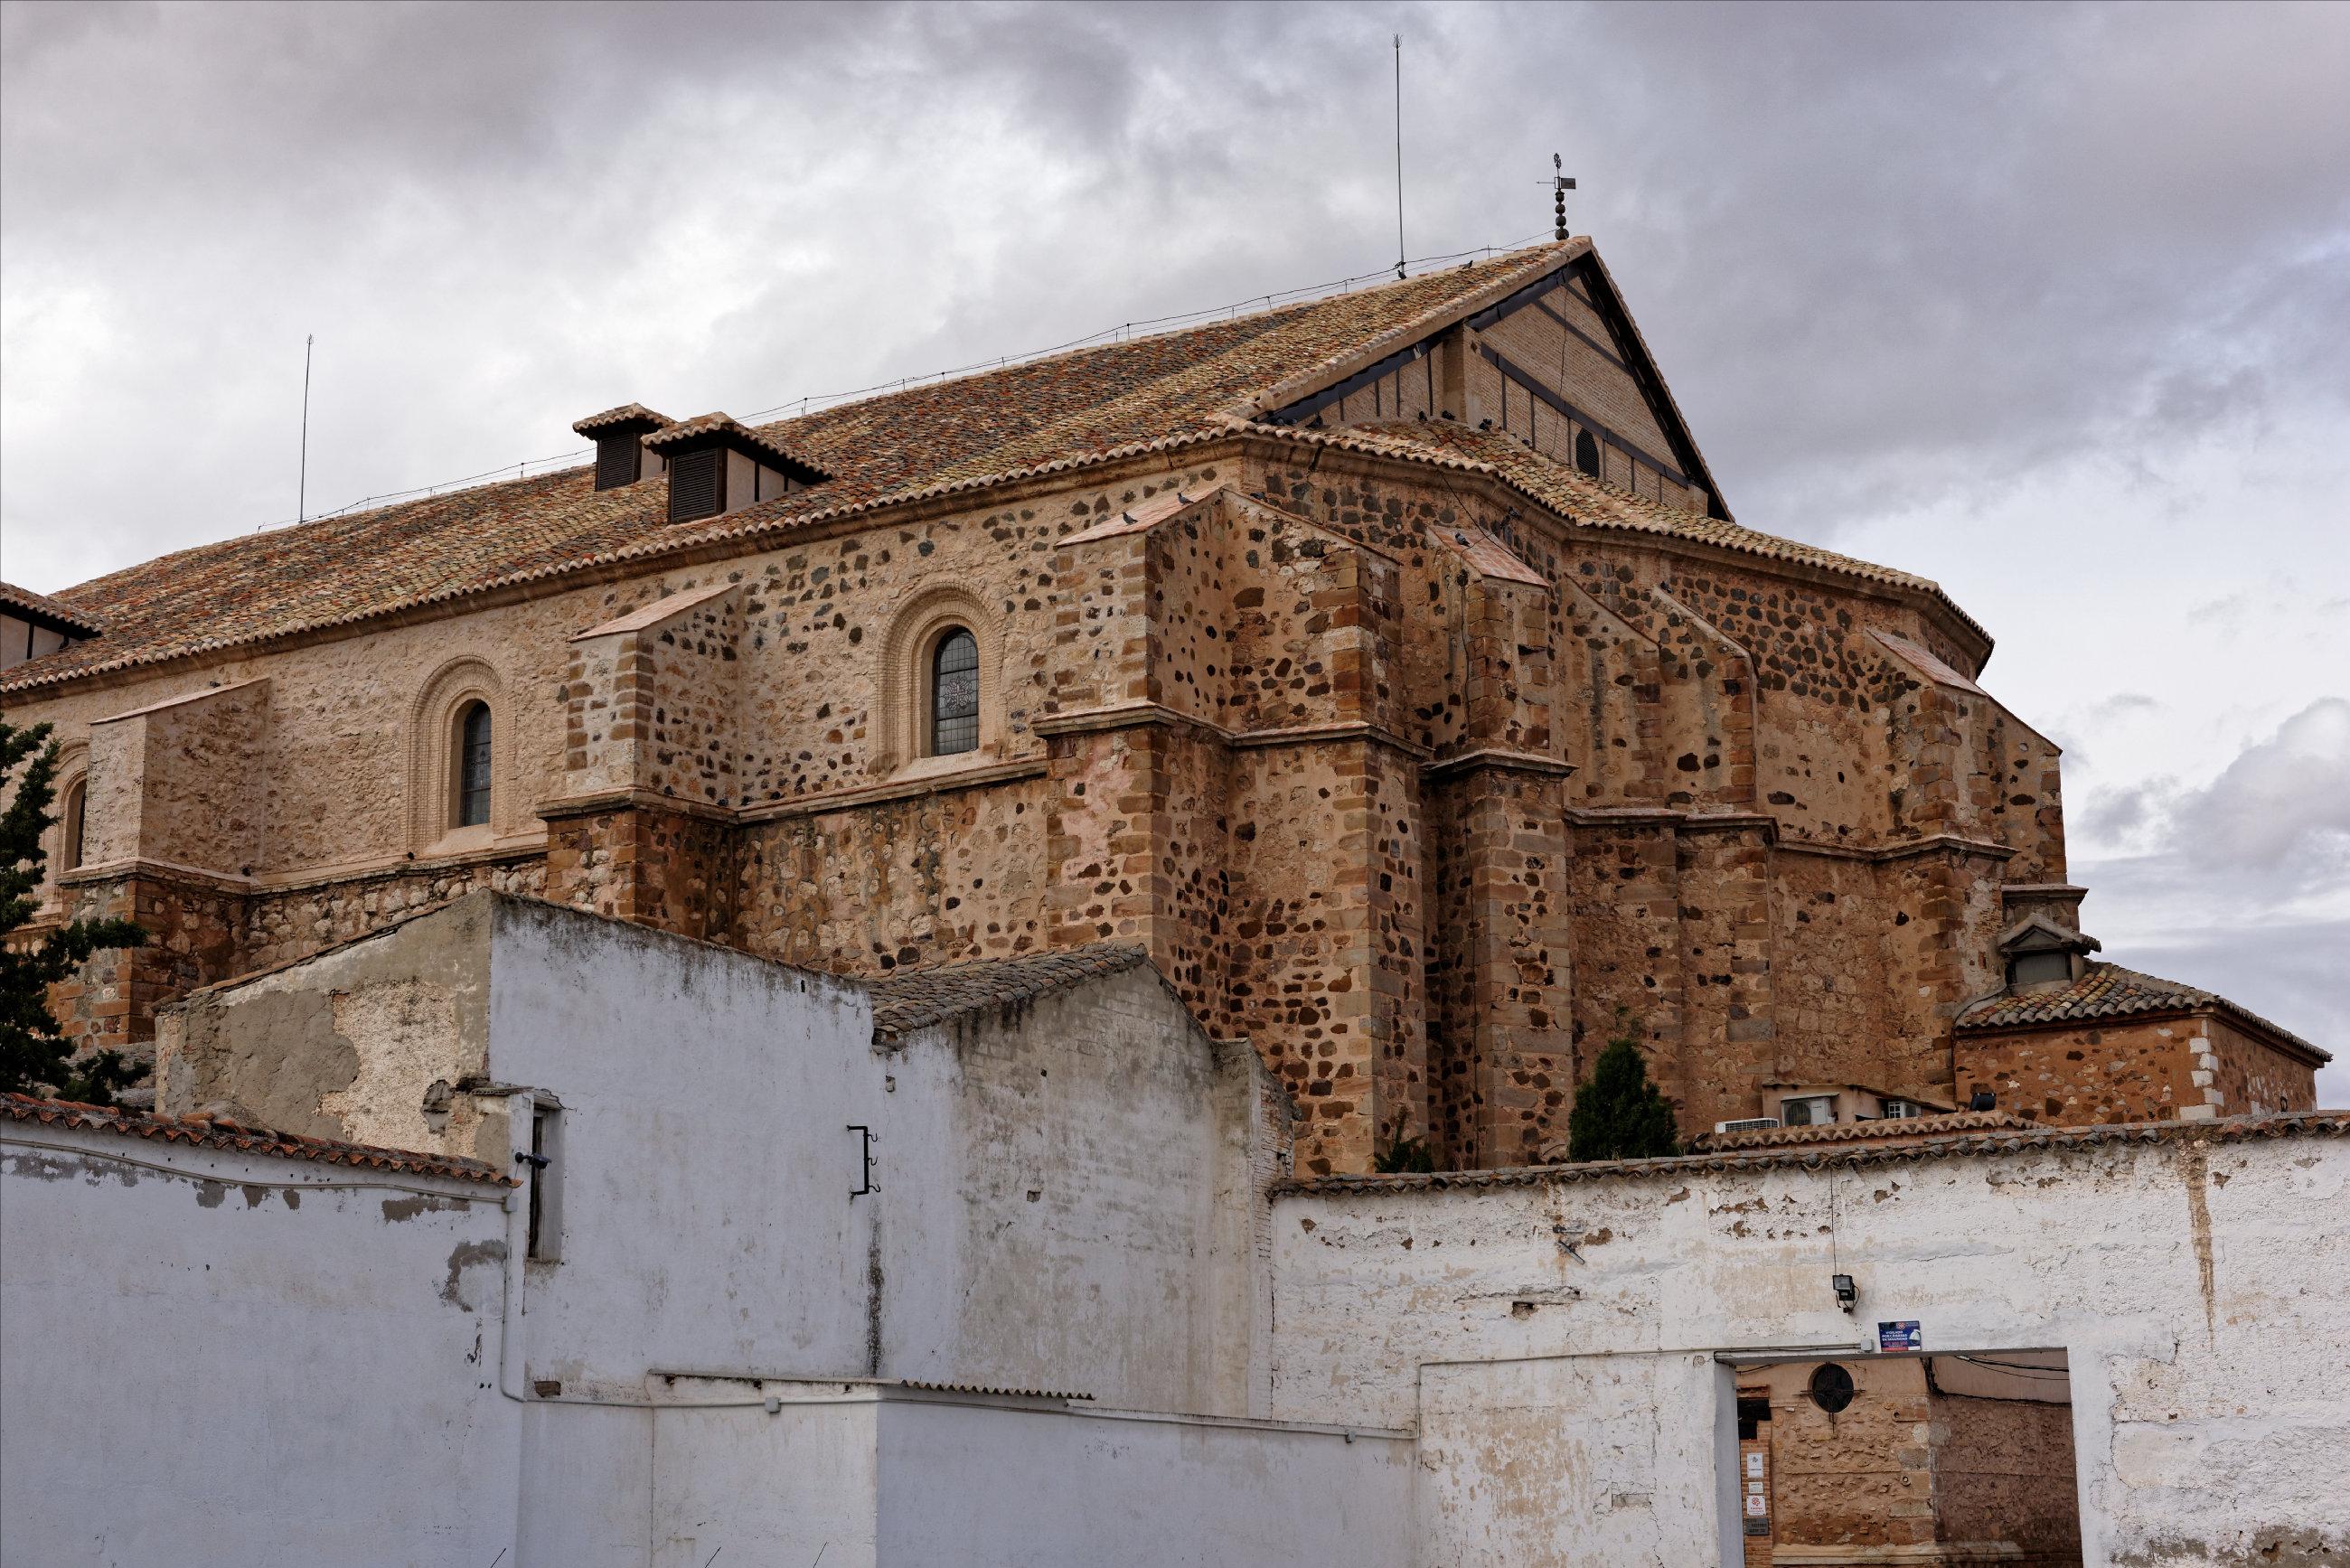 151102-Almagro (10)